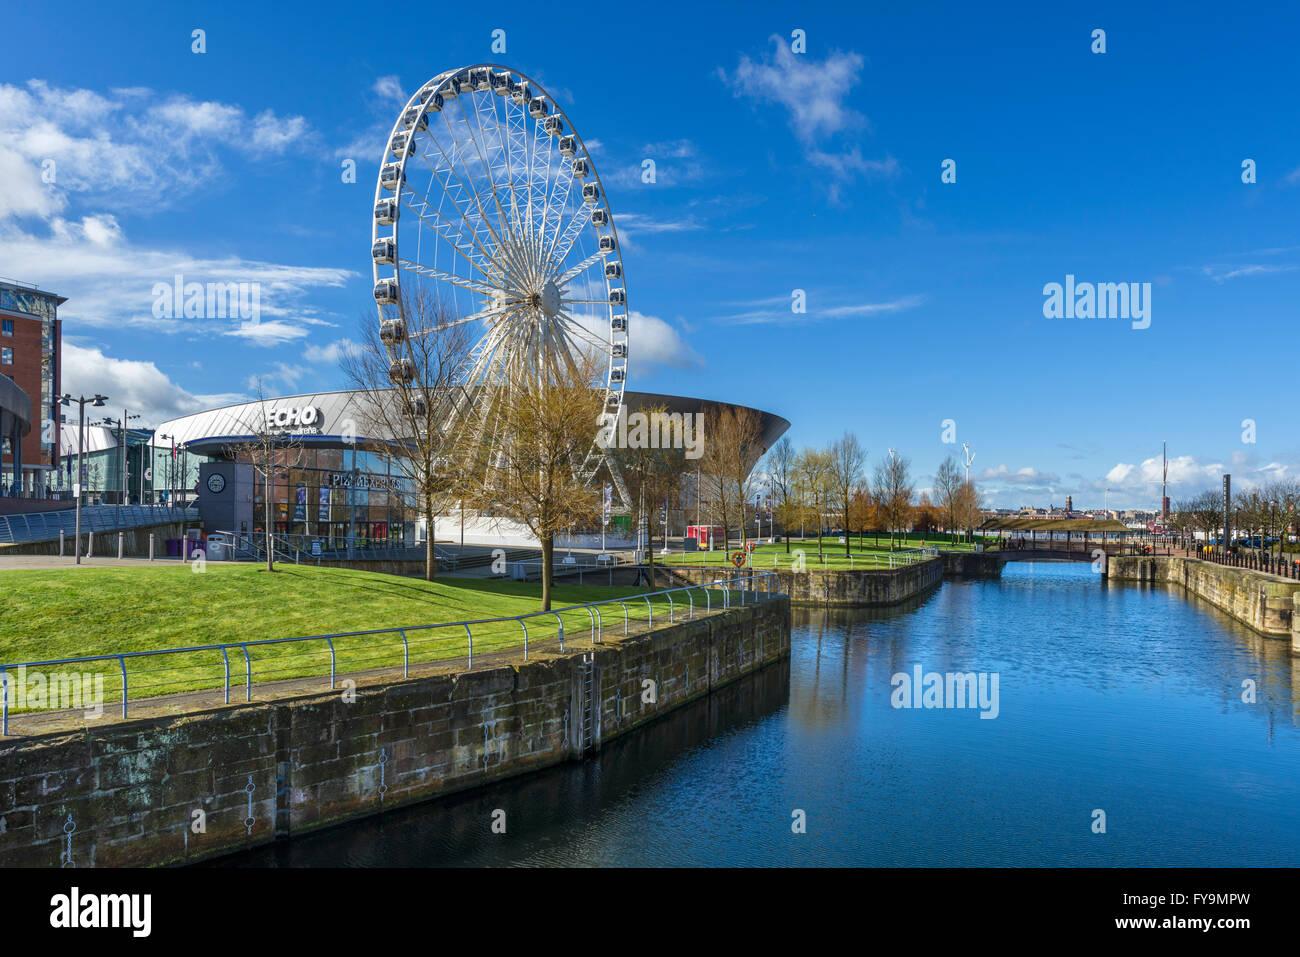 The Echo Arena and Wheel of Liverpool looking over Dukes Dock, Albert Dock area, Liverpool, Merseyside, England, - Stock Image